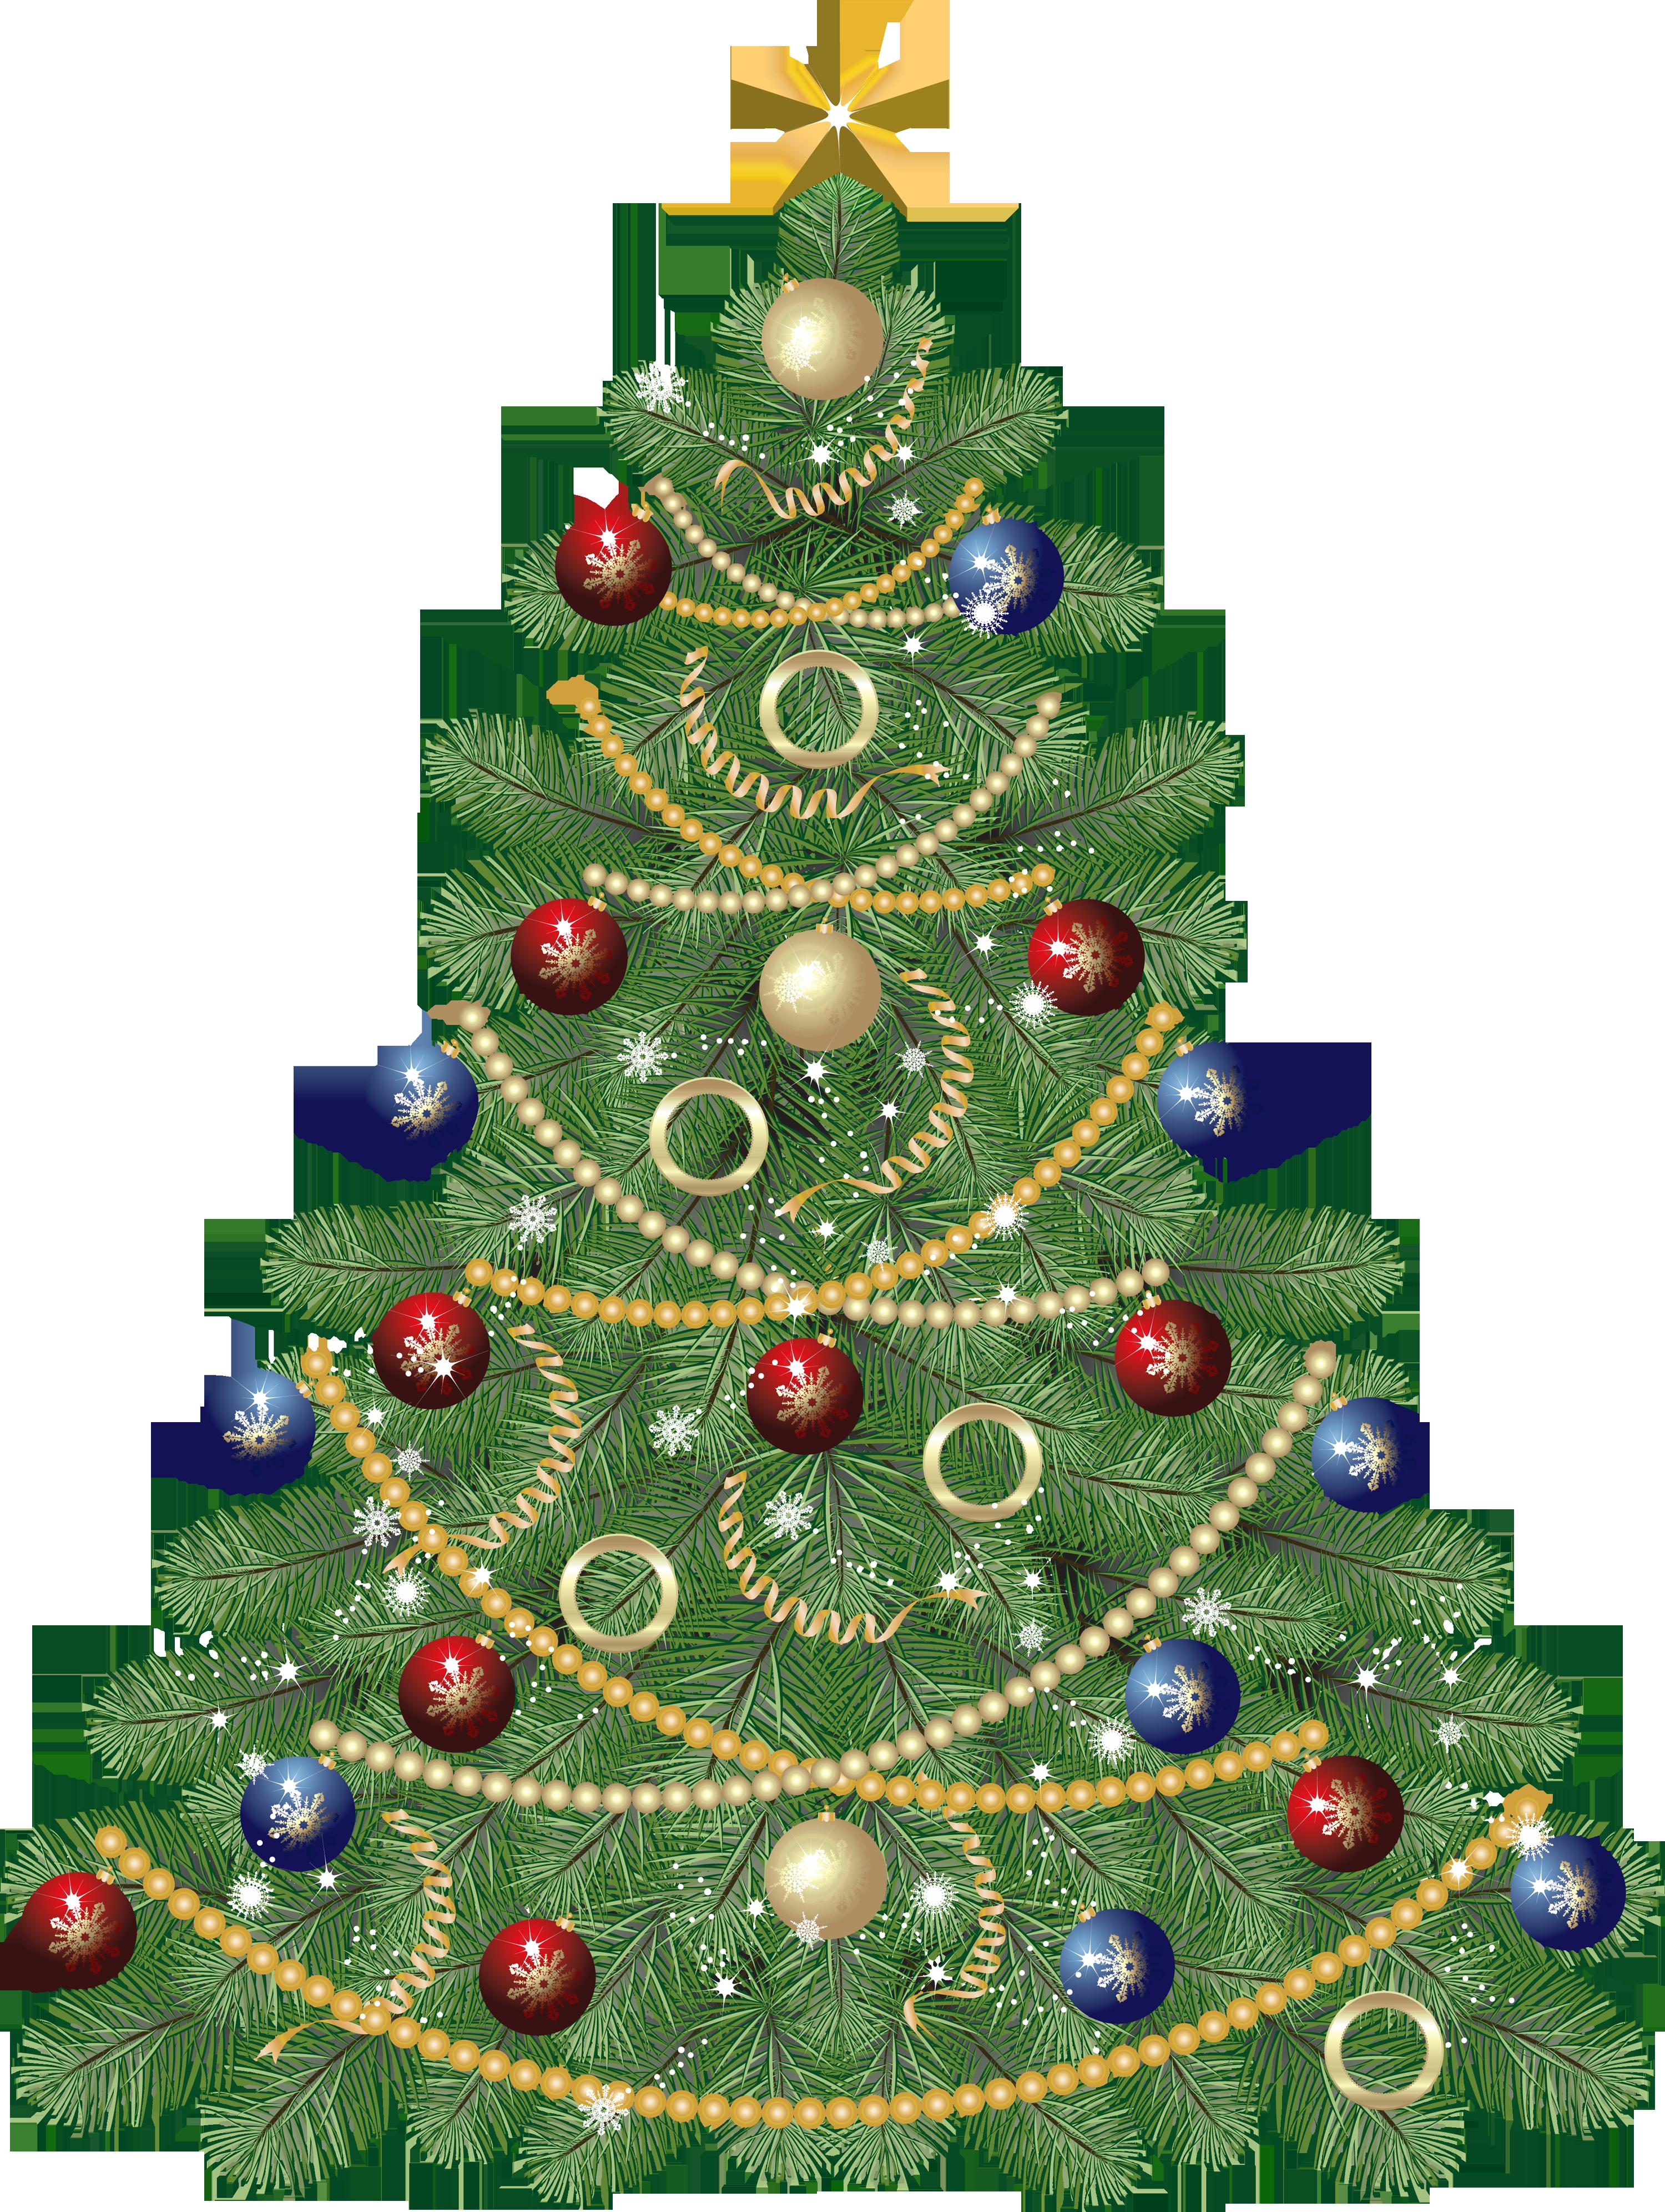 Free Christmas Tree Clipart Public Domai-Free christmas tree clipart public domain christmas clip art 4-16